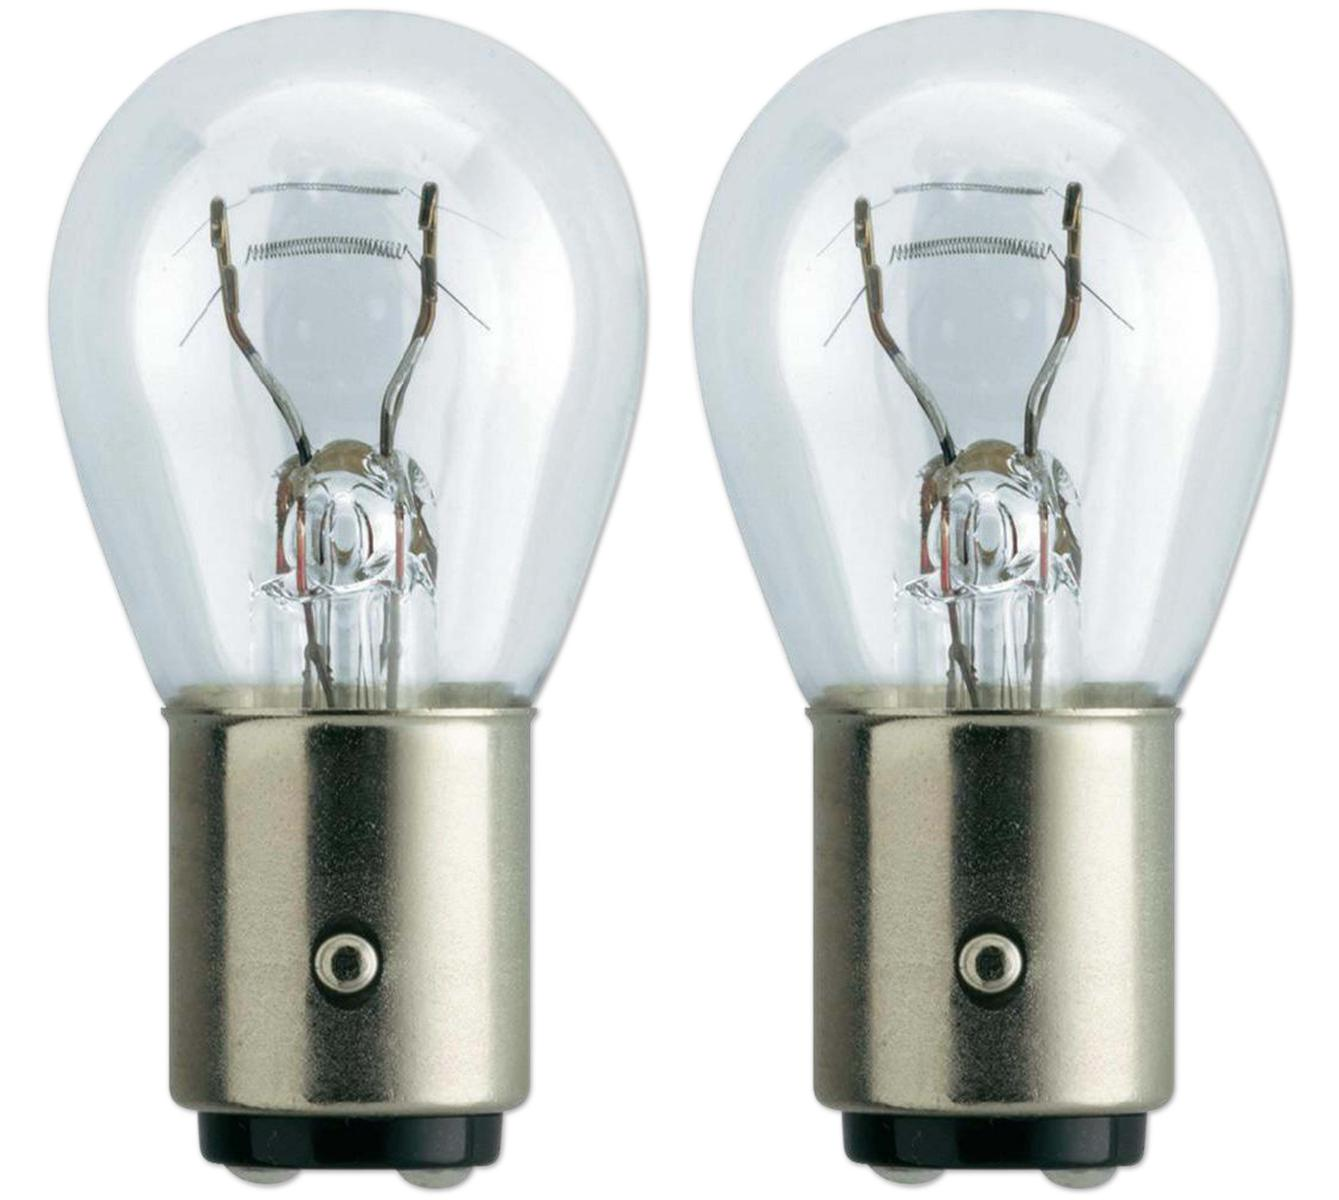 bottari-30148x-lamp-12v-5-21w-bay15d-caja-10-unid-